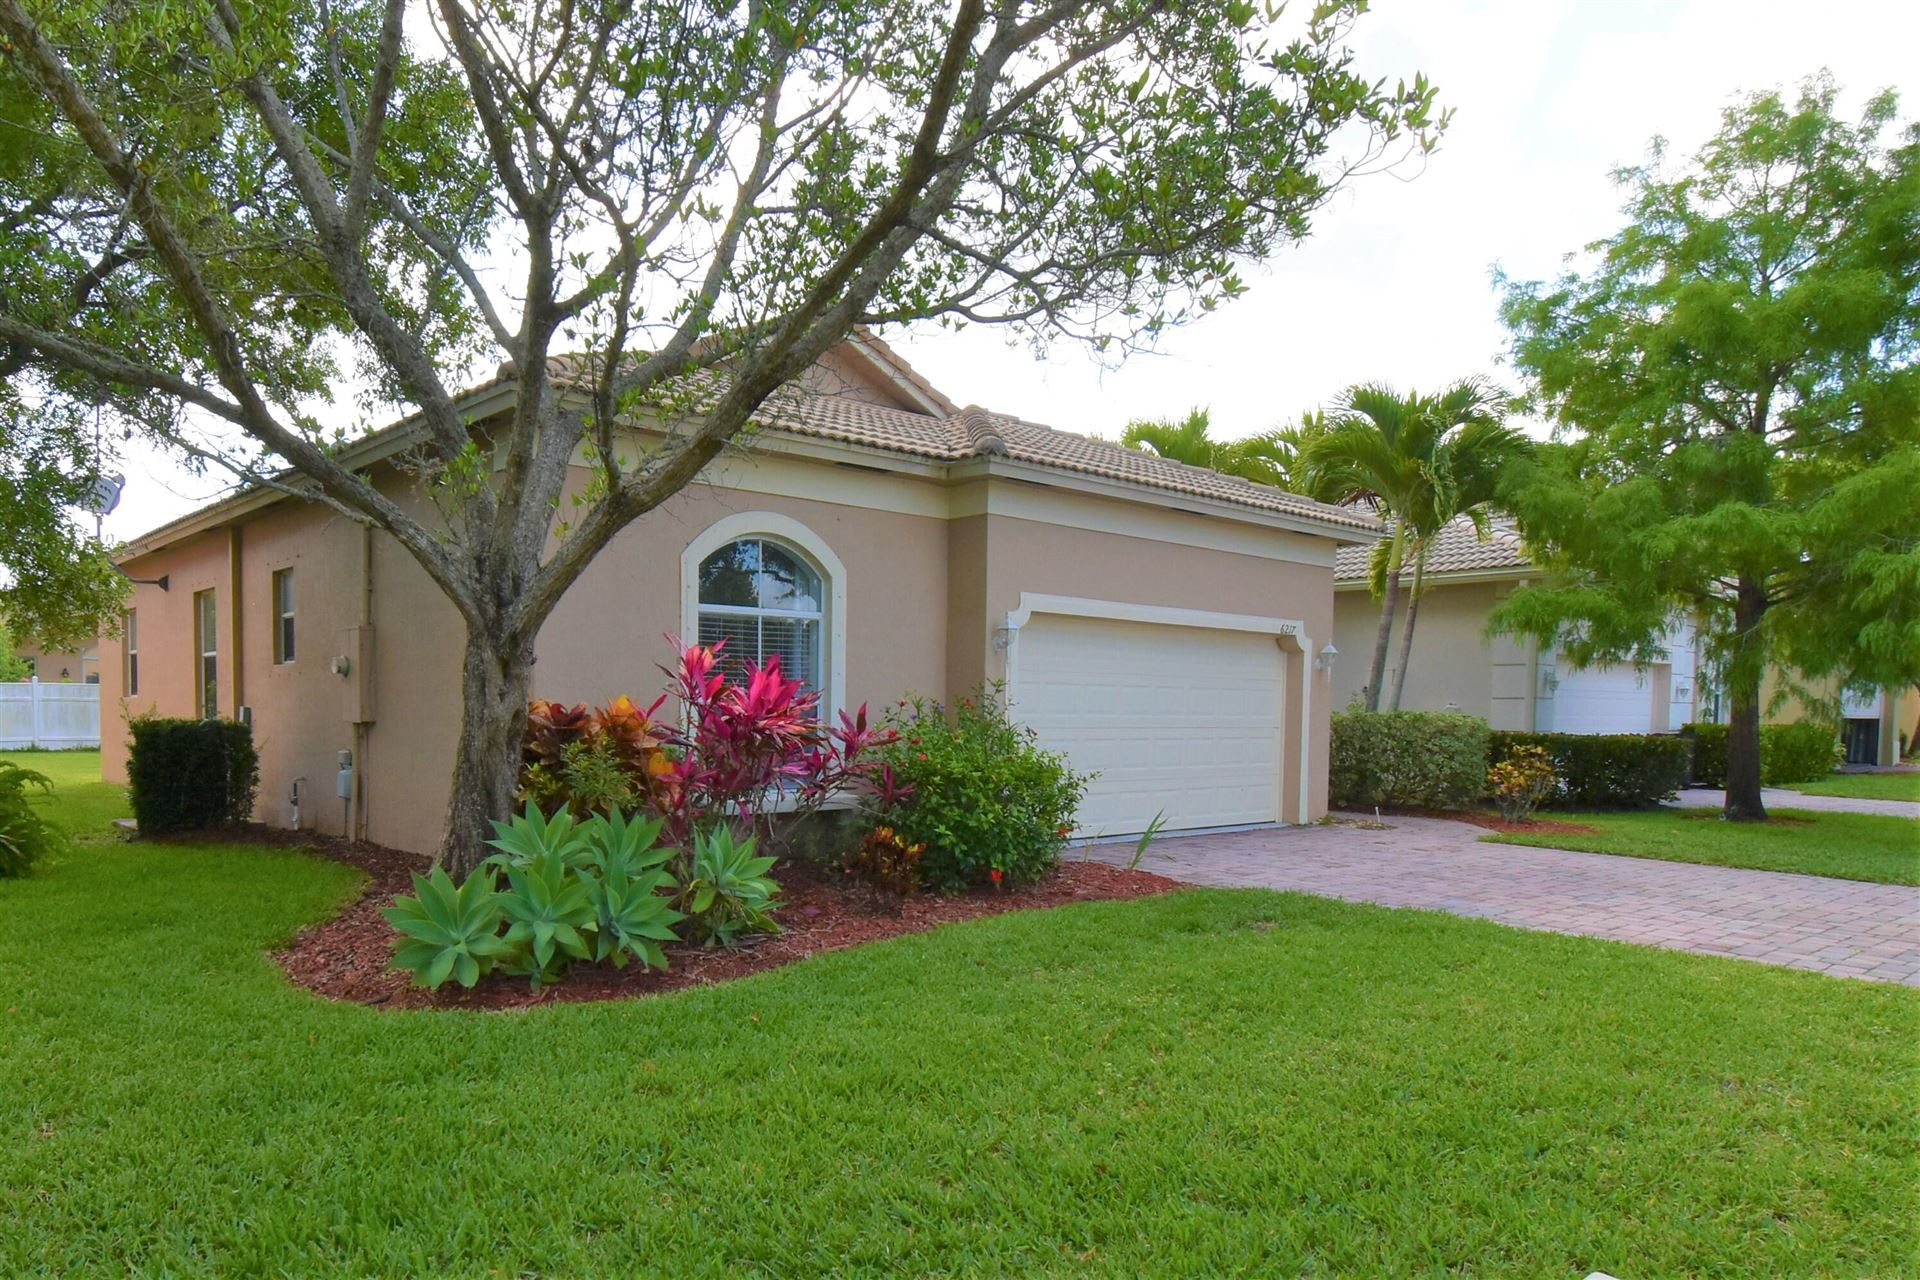 6217 Santa Margarito Drive, Fort Pierce, FL 34951 - #: RX-10725604